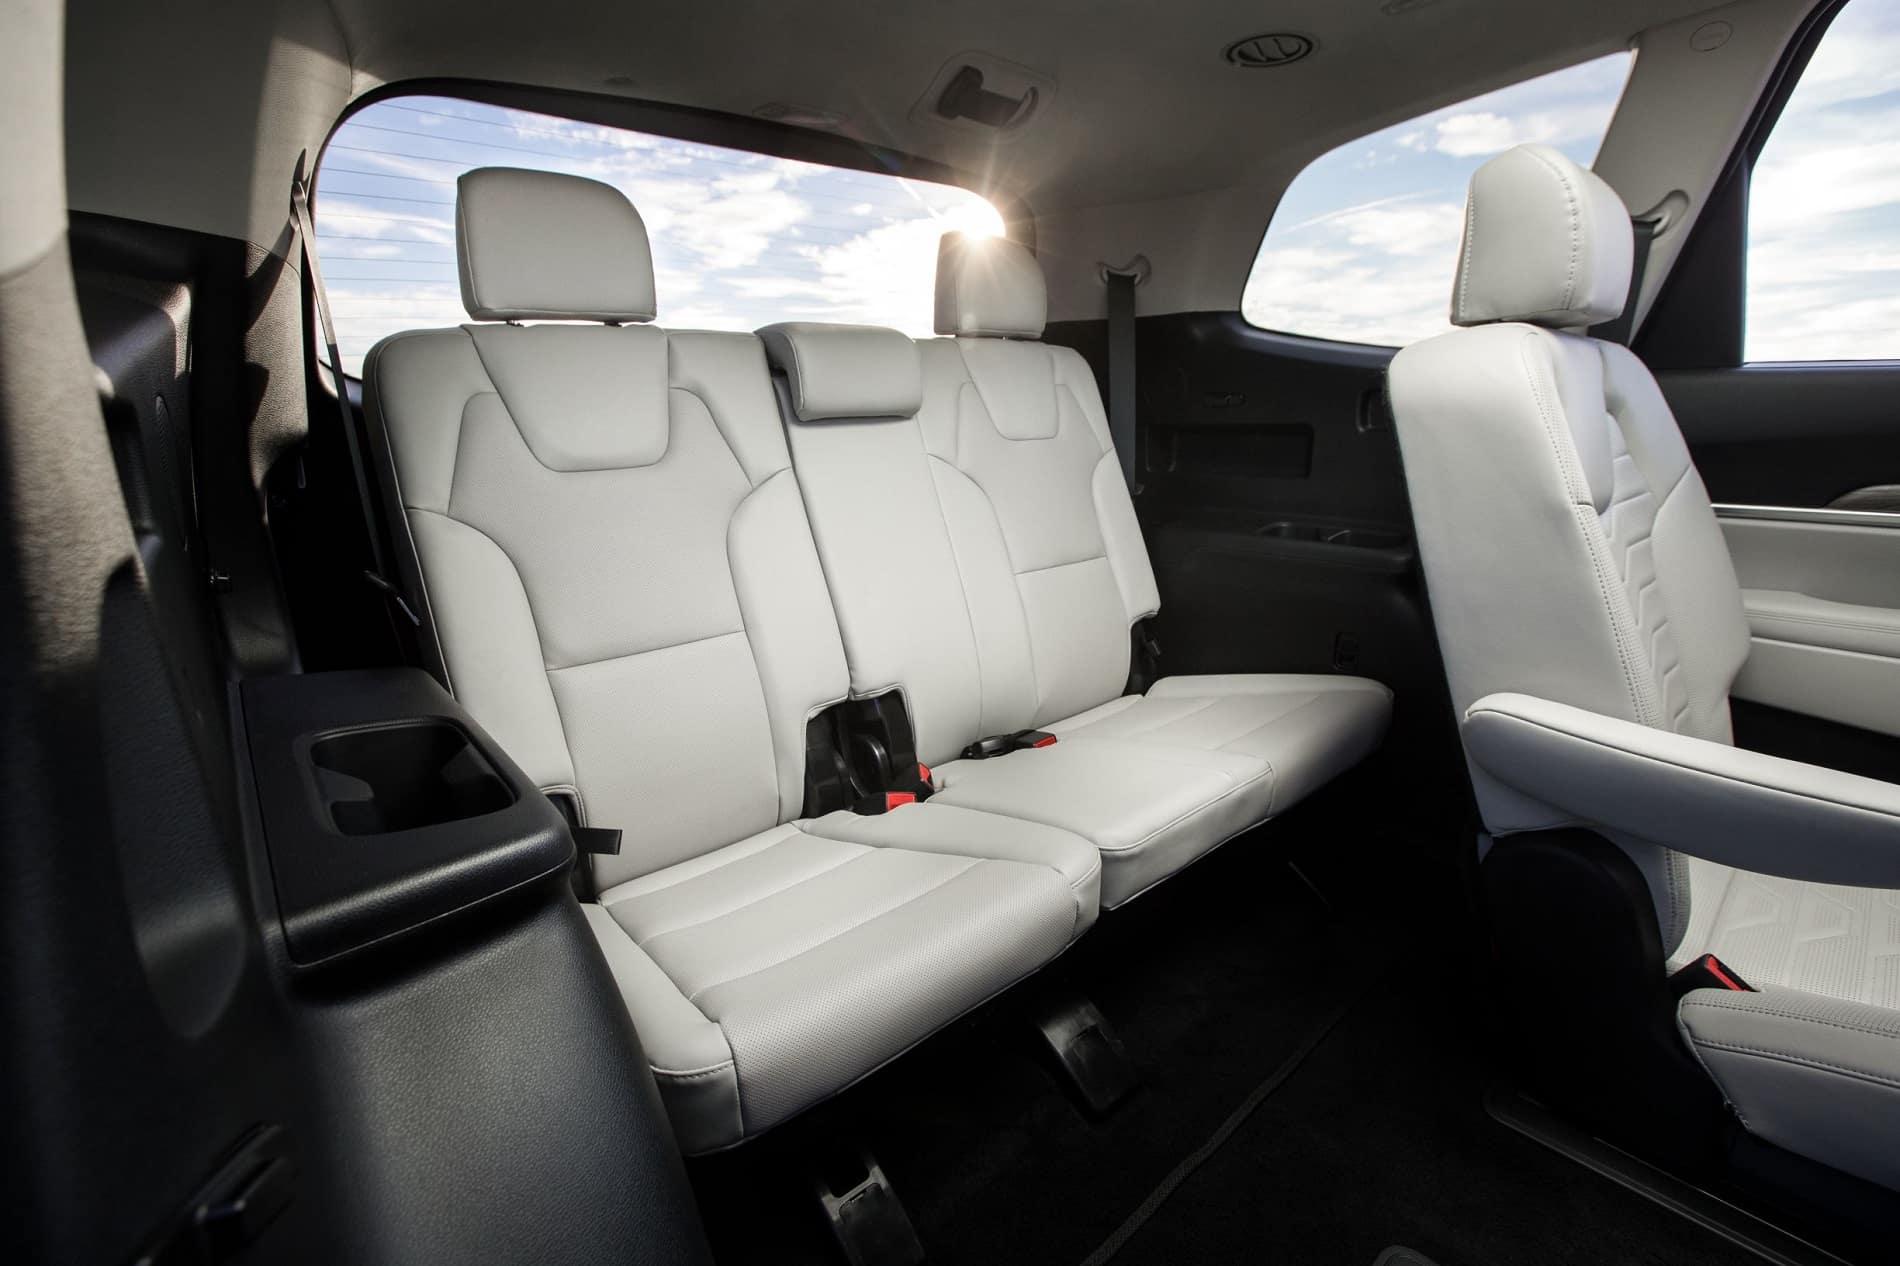 2020 Kia Telluride Roomy, Spacious Leg Room in Rear Seats Interior Mid Size Luxury SUV at Kia of Valencia near Santa Clarita, CA and Los Angeles Metro